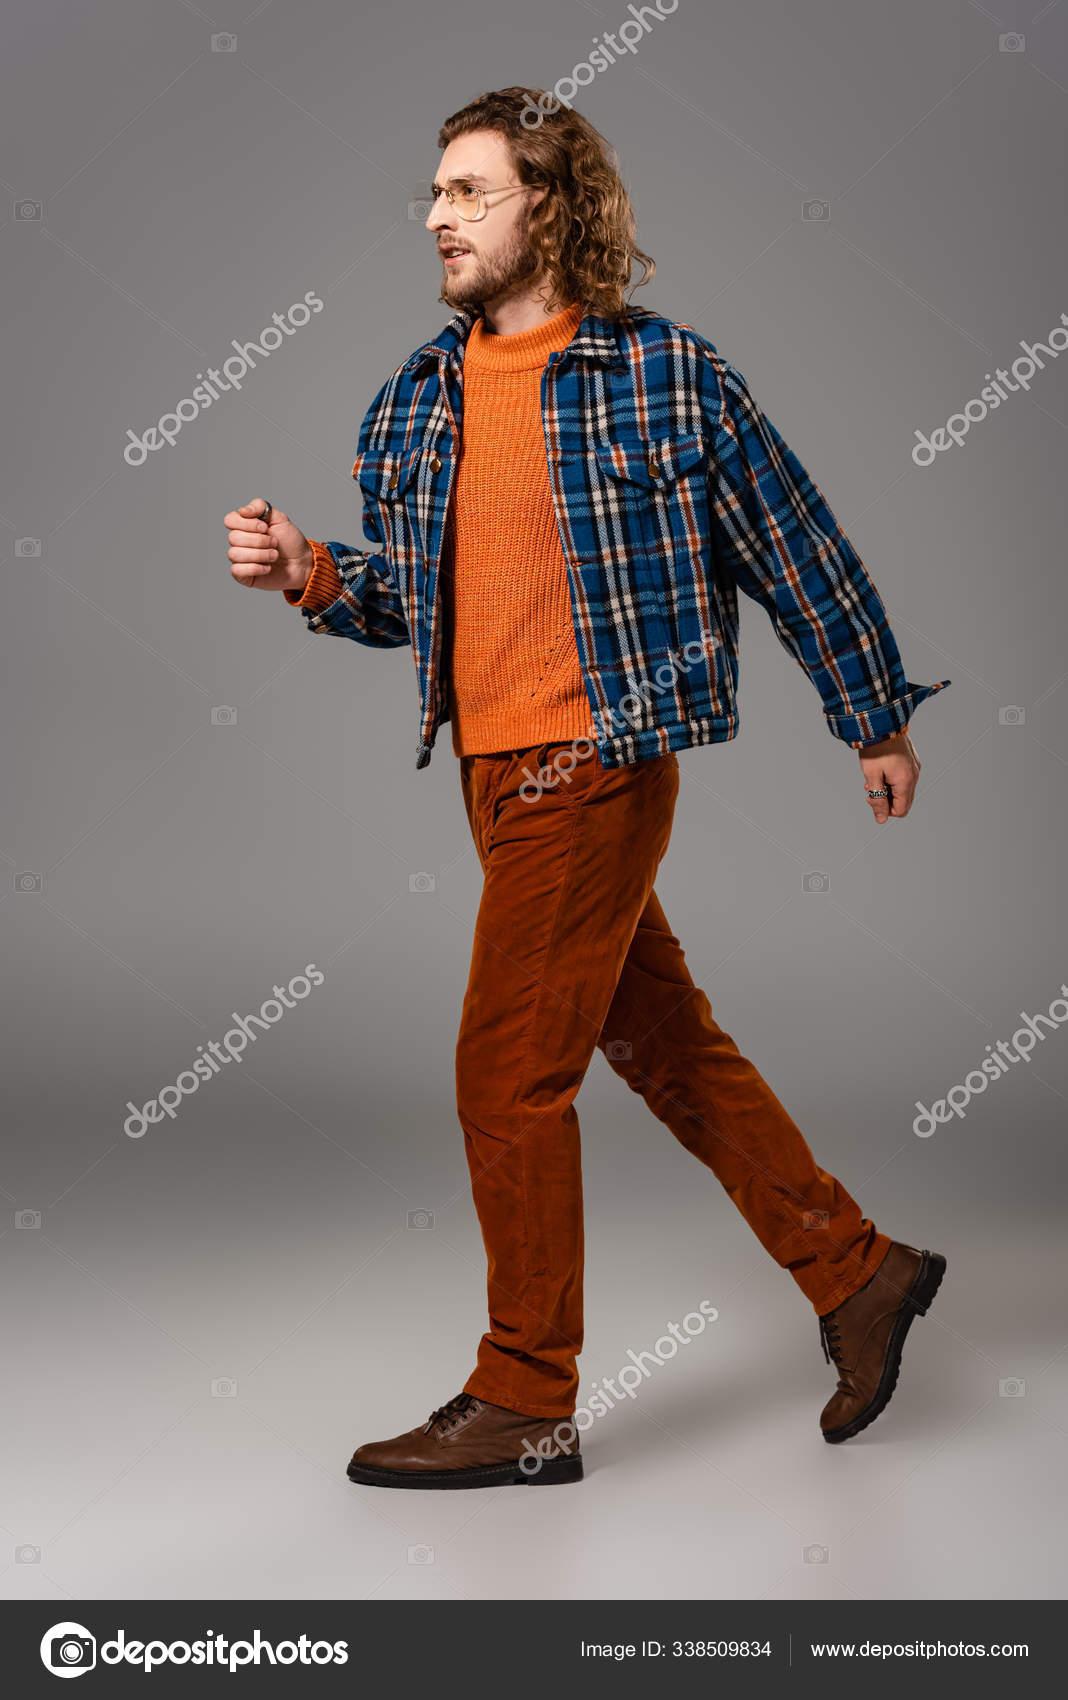 Hombre Guapo Camisa Pantalones Caminando Sobre Fondo Gris Foto De Stock C Andrewlozovyi 338509834